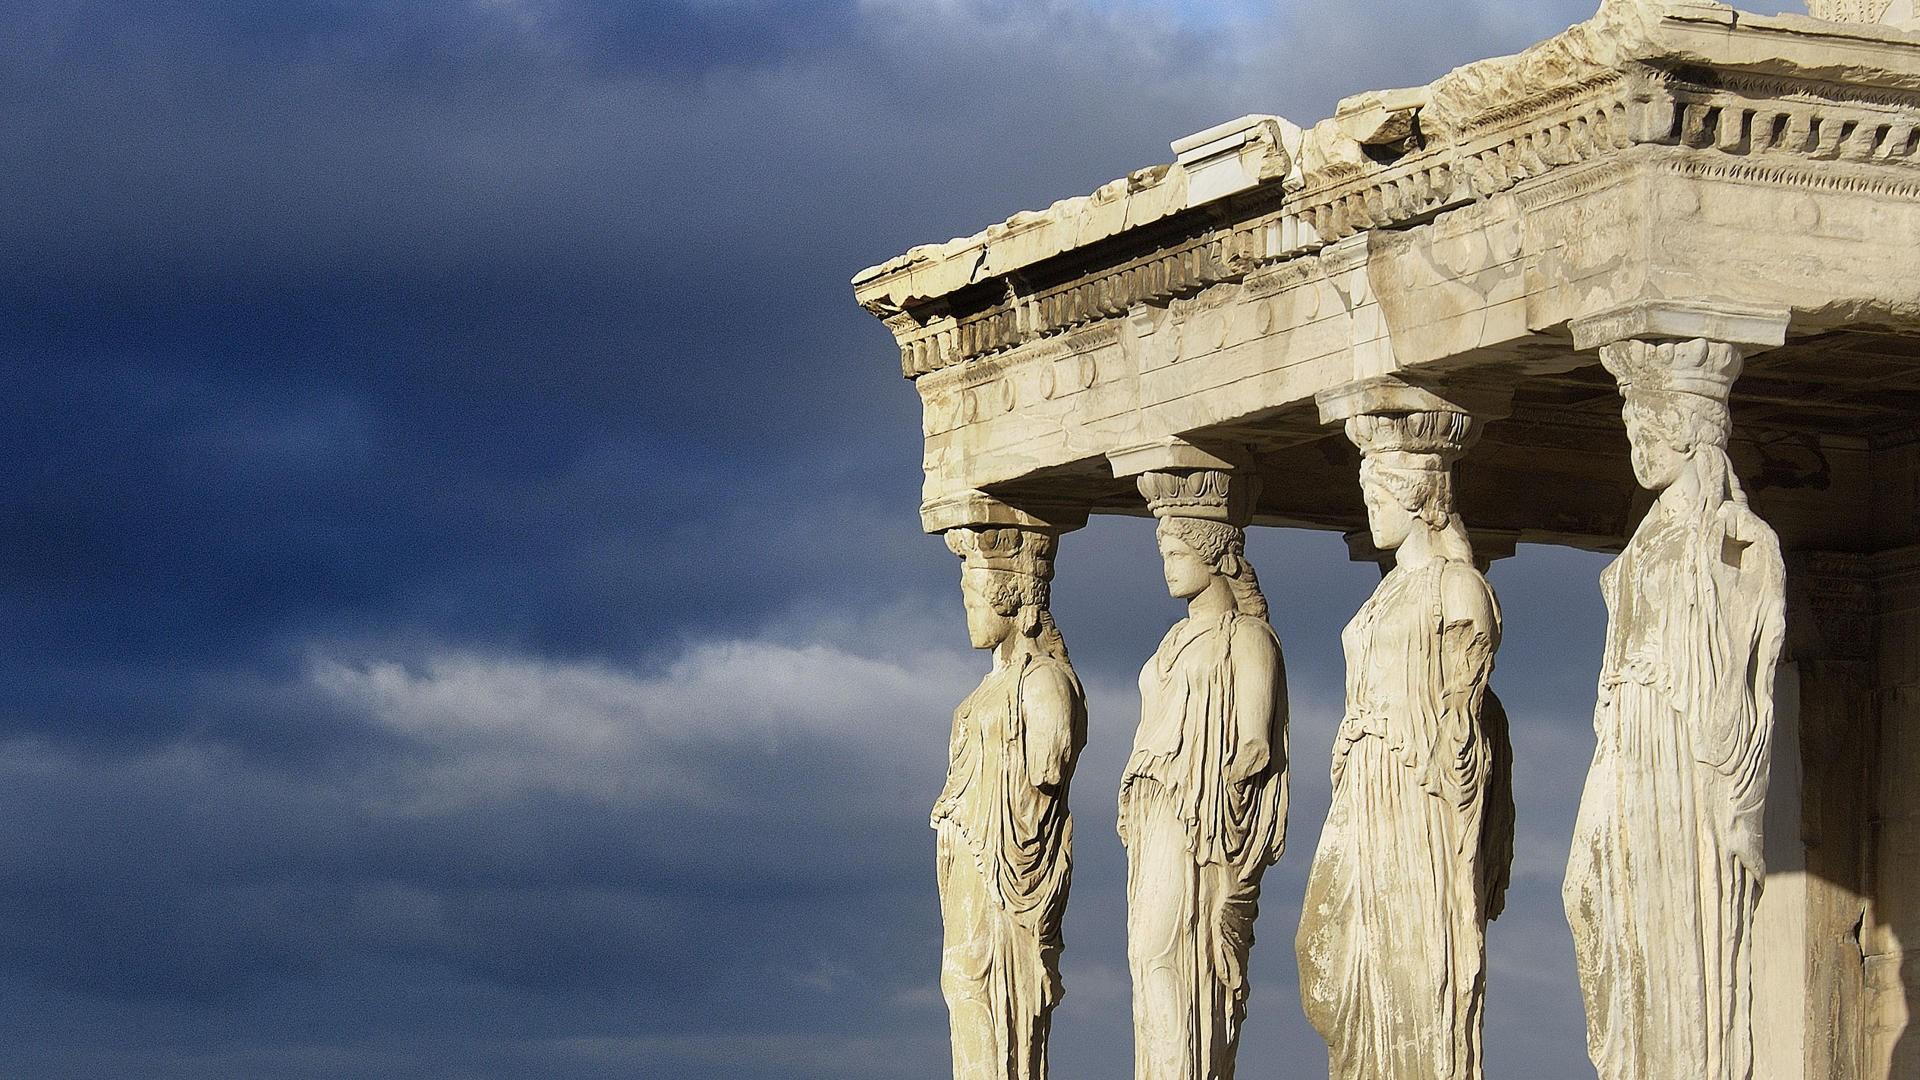 Desktop Backgrounds: Greek Architecture (#PLB6666, INC:46, 4K Ultra HD)